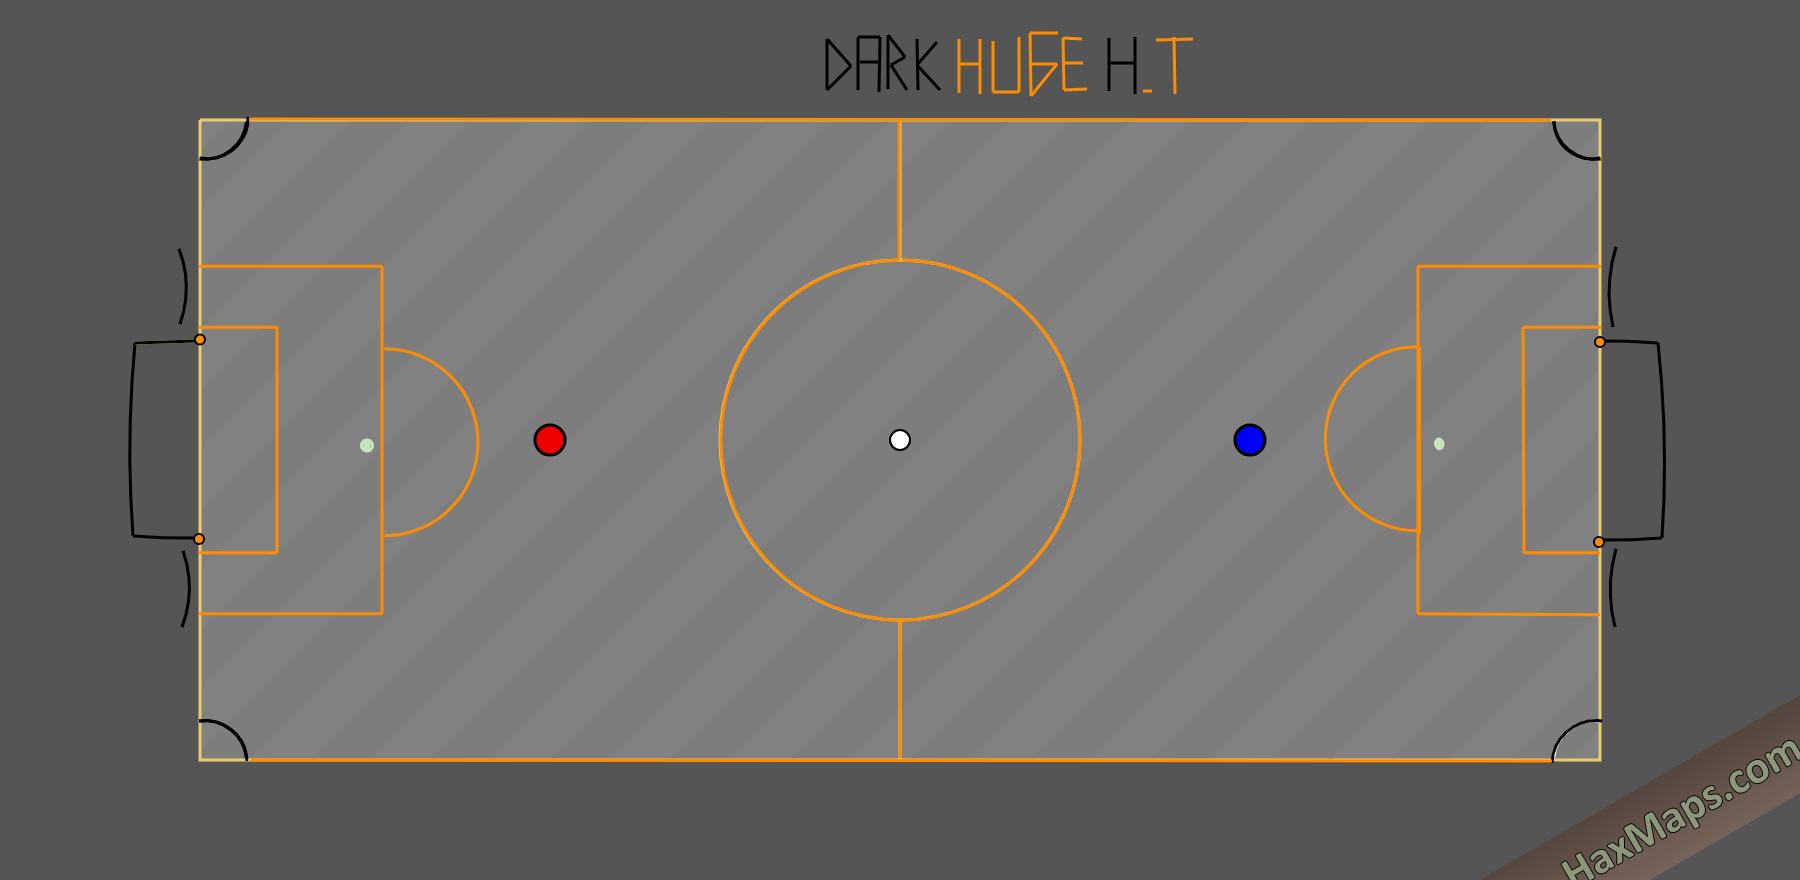 haxball maps | Mini Real Soccer Dark Huge